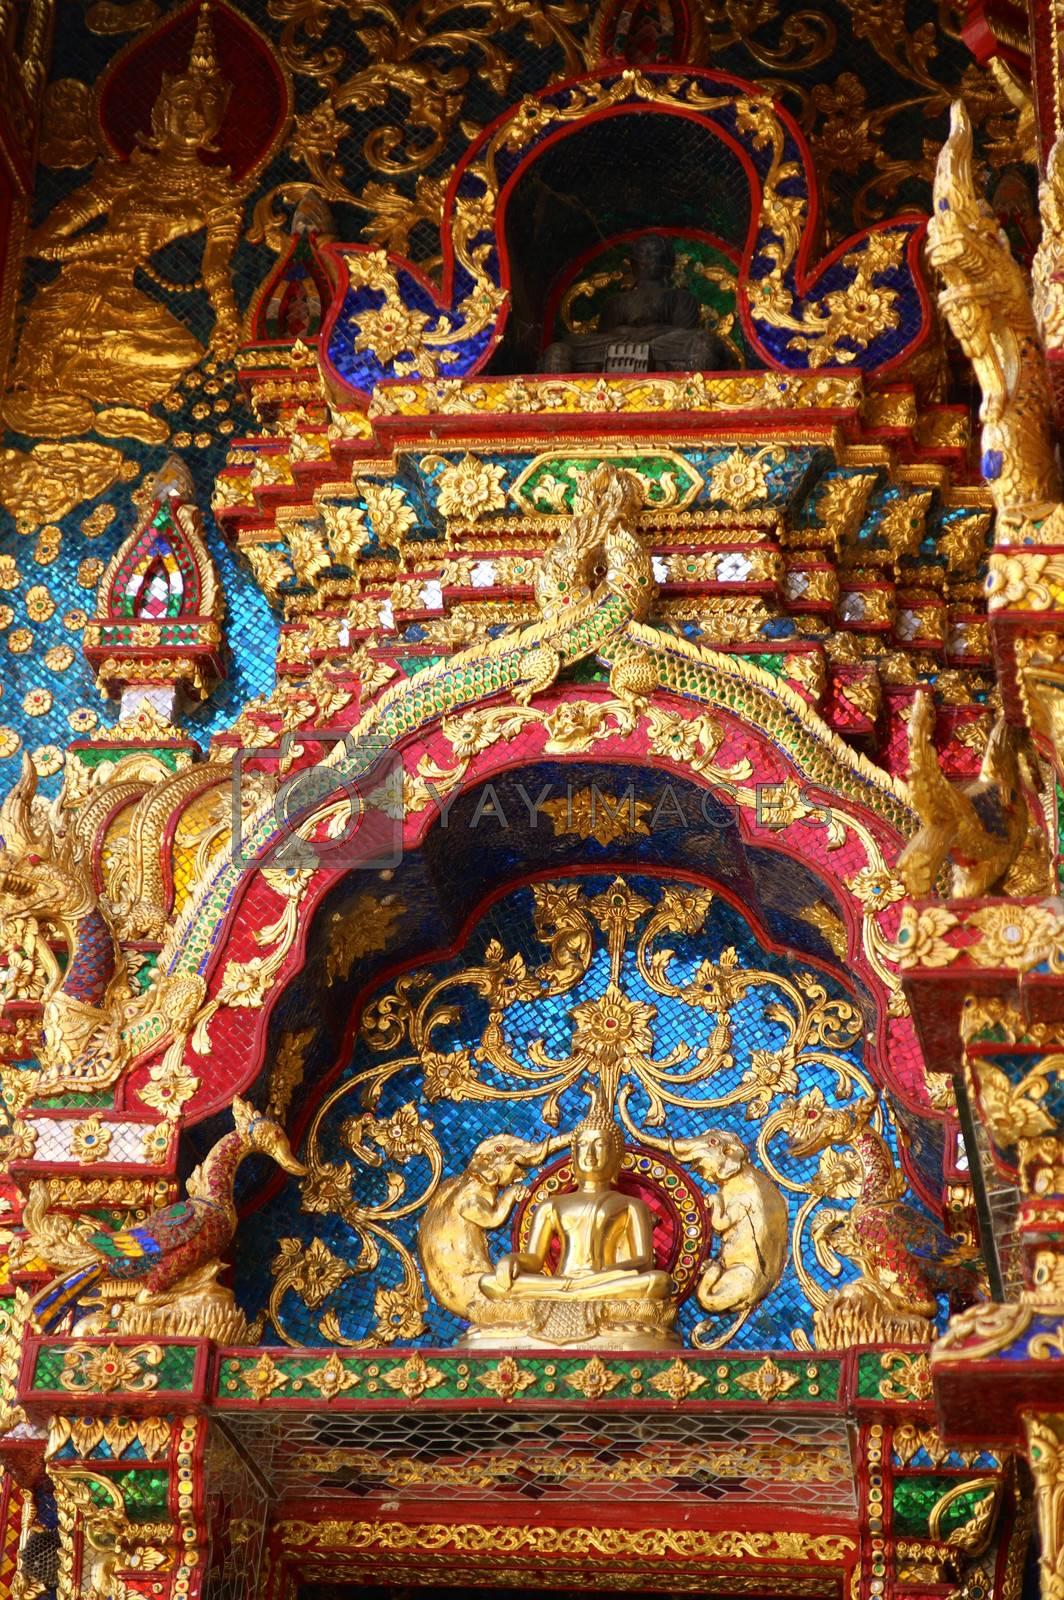 Royalty free image of golden gate1 by nattapatt